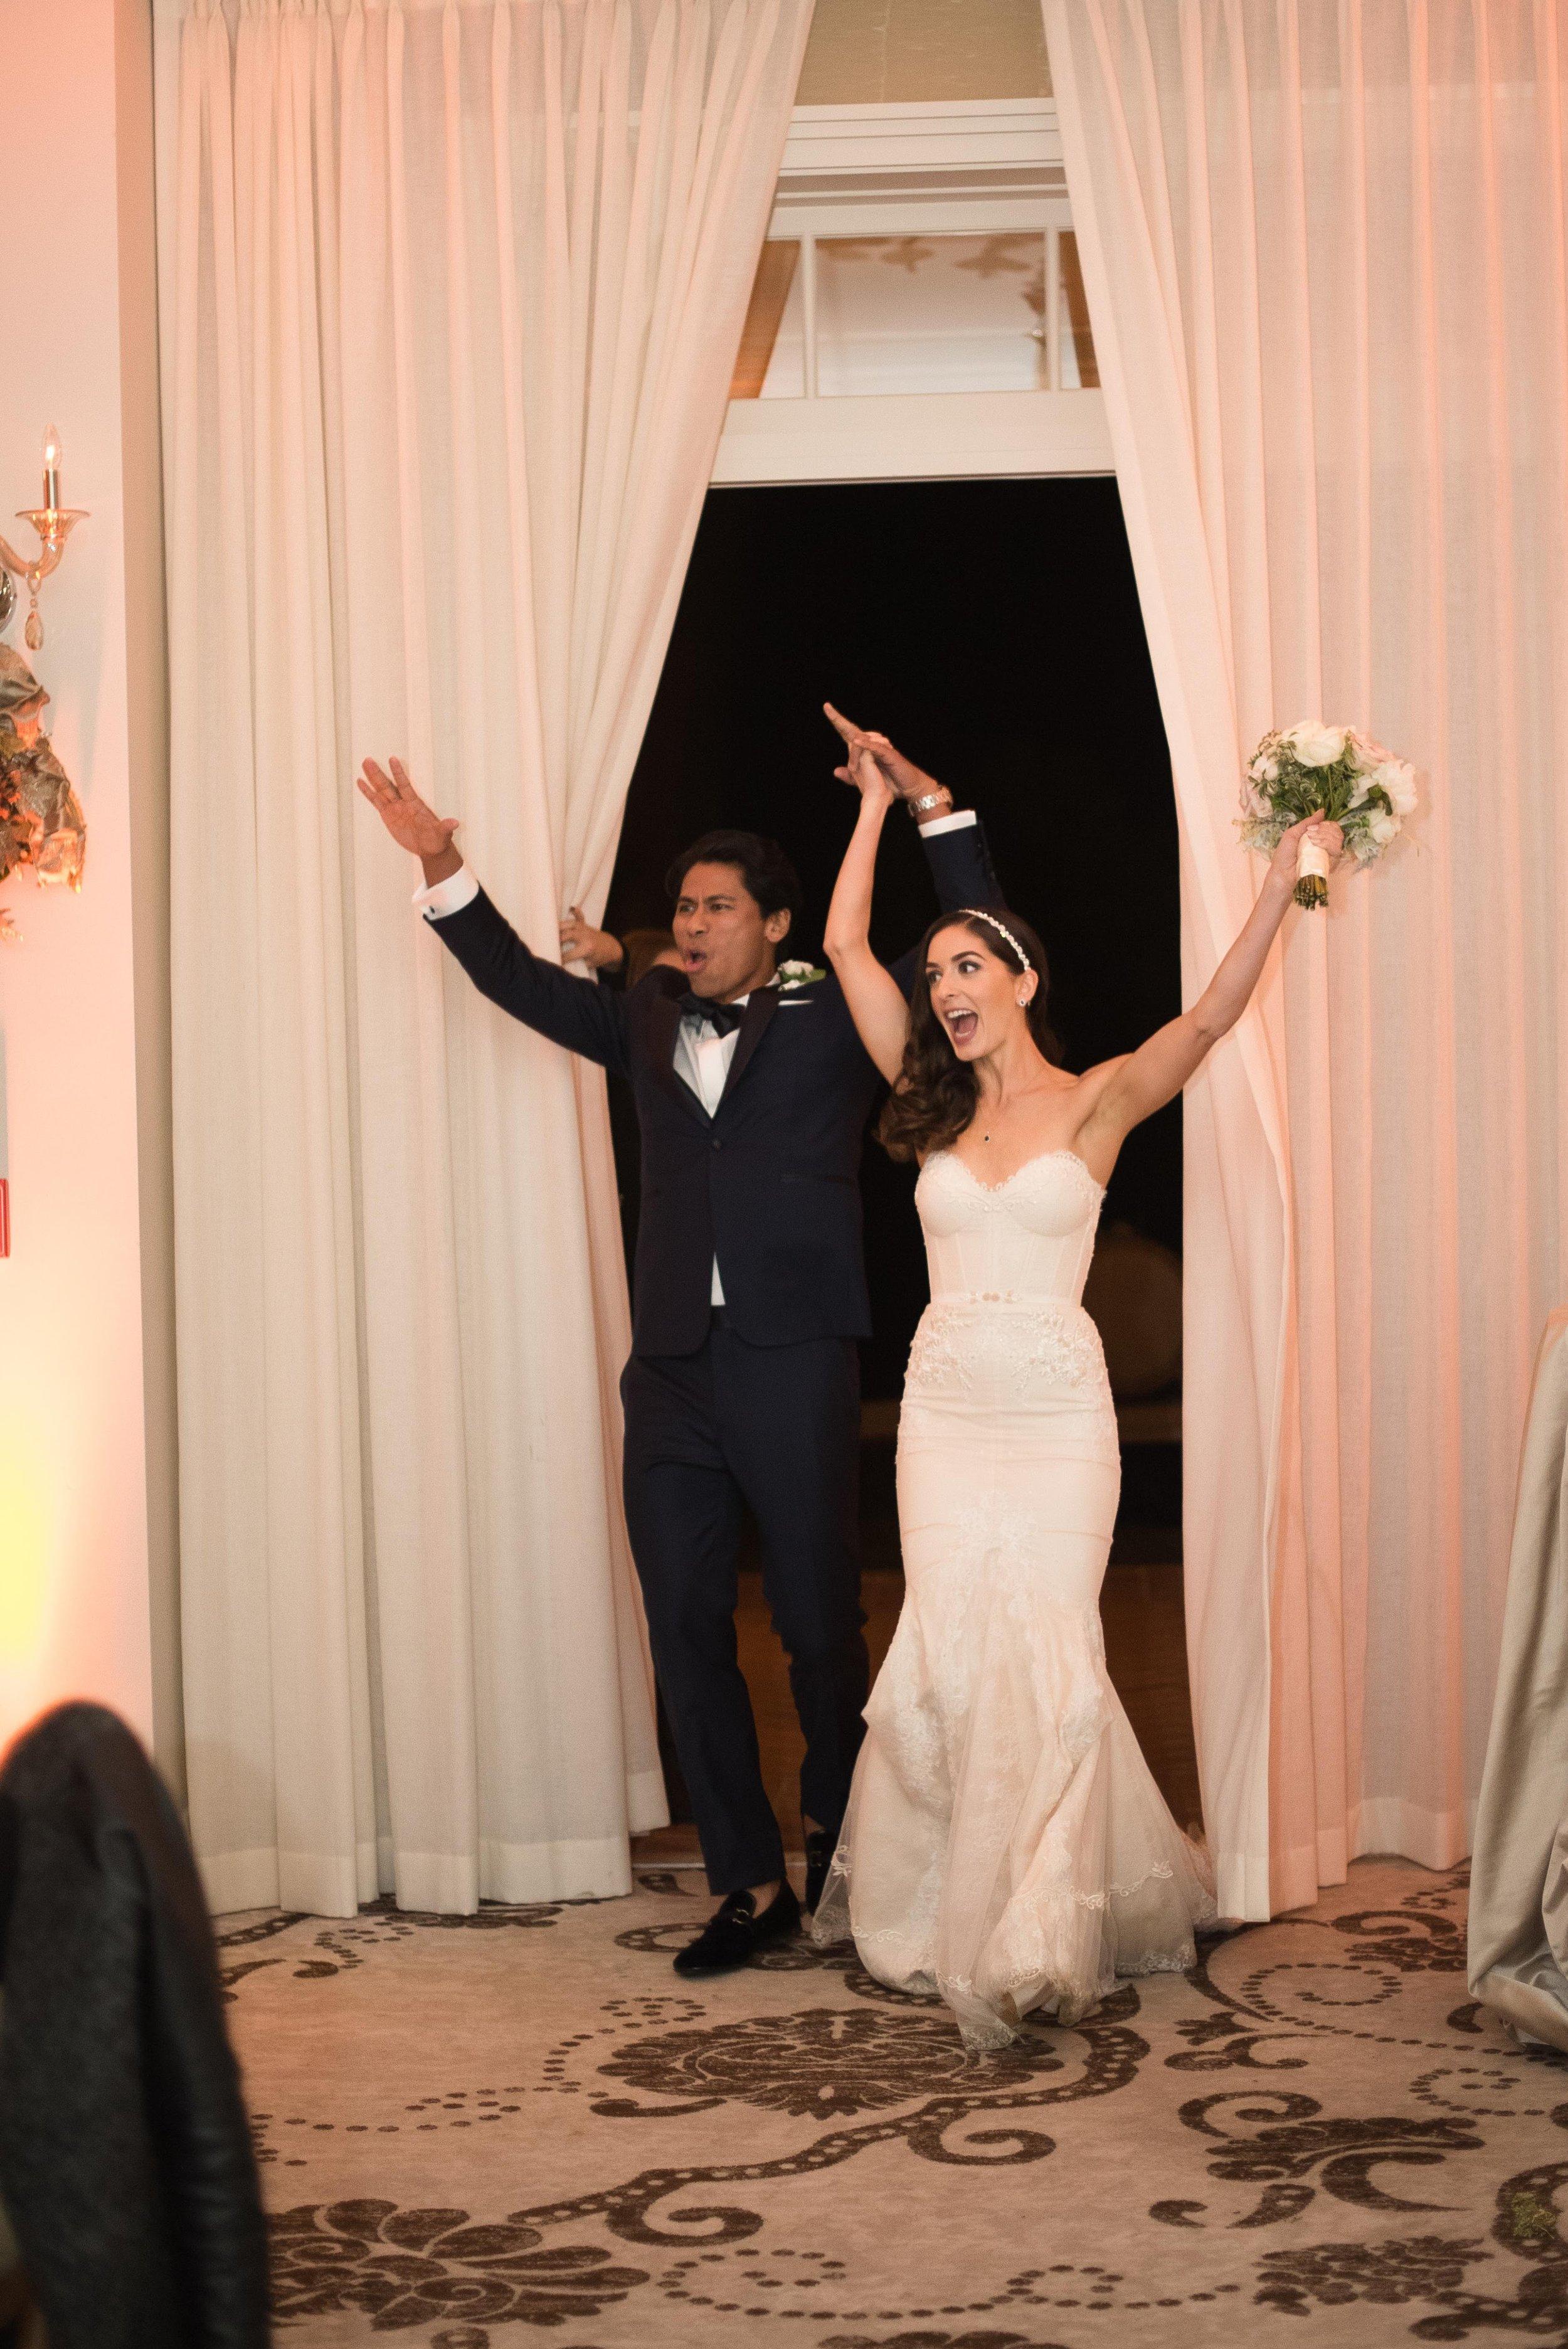 www.santabarbaraweddingstyle.com | San | Felici Events | Belmond El Encanto | Nate & Jenny Weddings | Precious and Blooming | Reception | Navy and Gold Wedding Grand Entrance